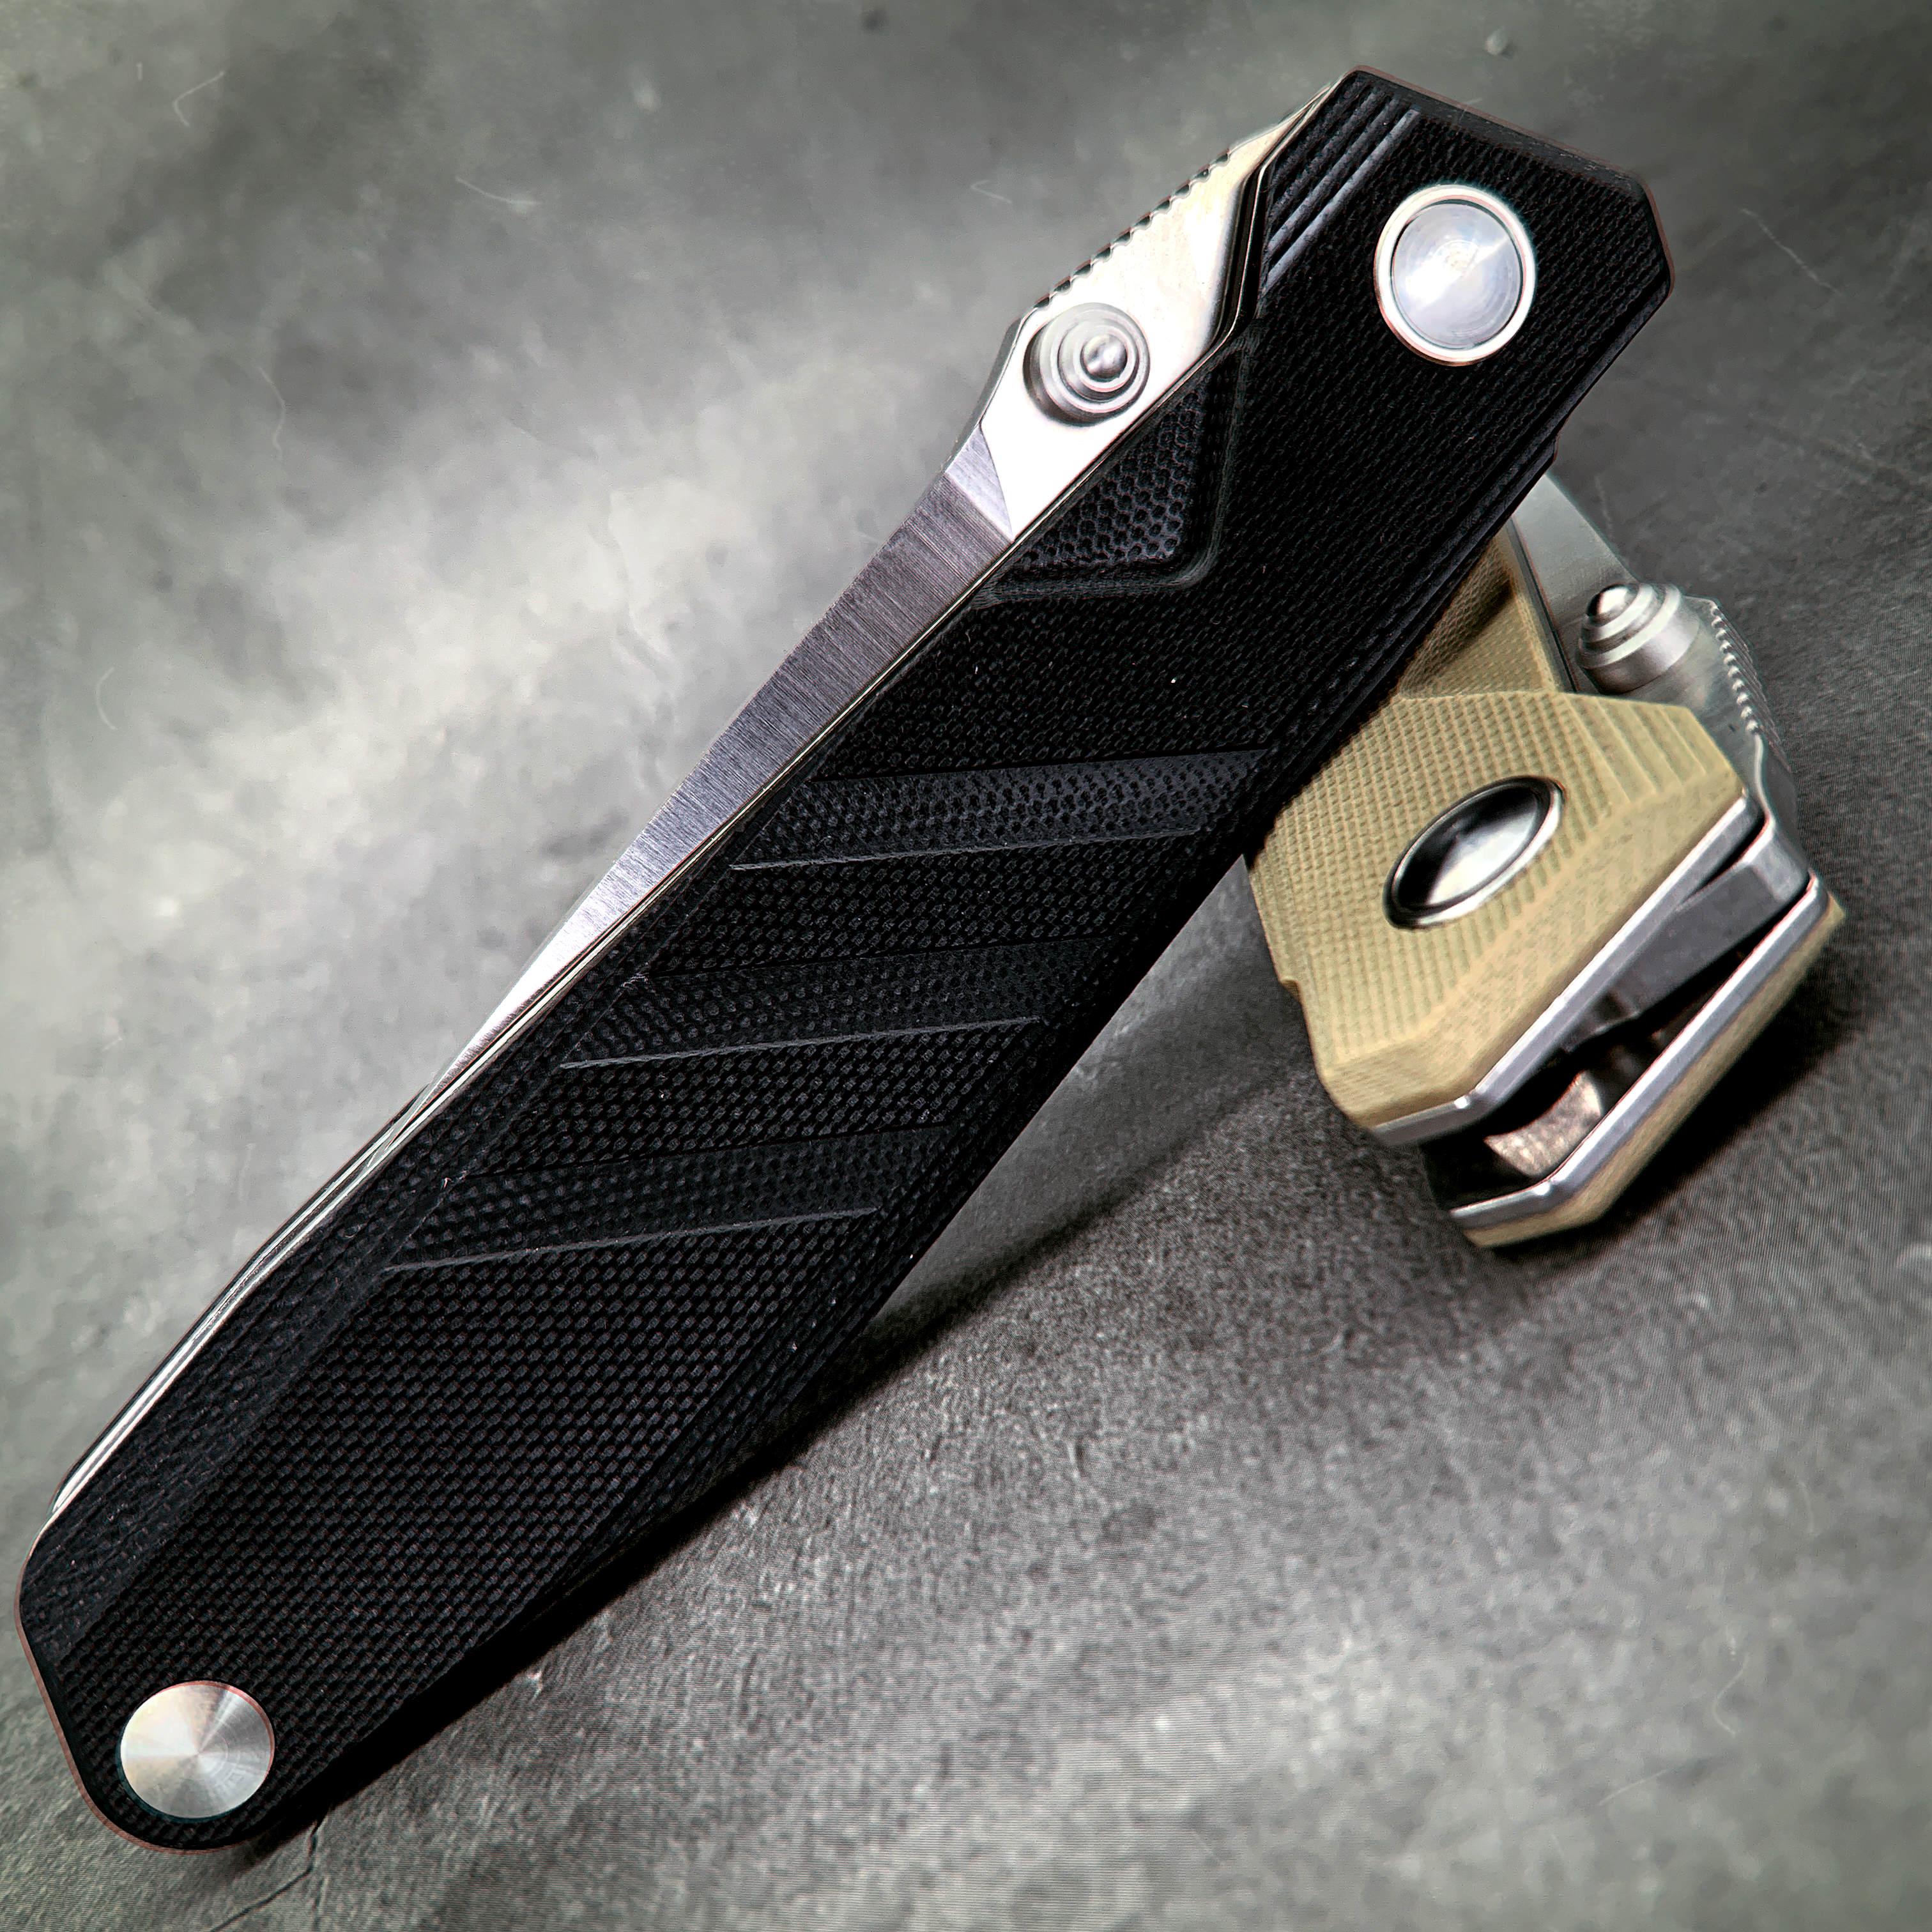 Tools : SANRENMU SRM 1158 Pocket Folding Blade Knife 8cr13 Steel Blade Edc Outdoor Camping Hunting Survival Fishing Tool